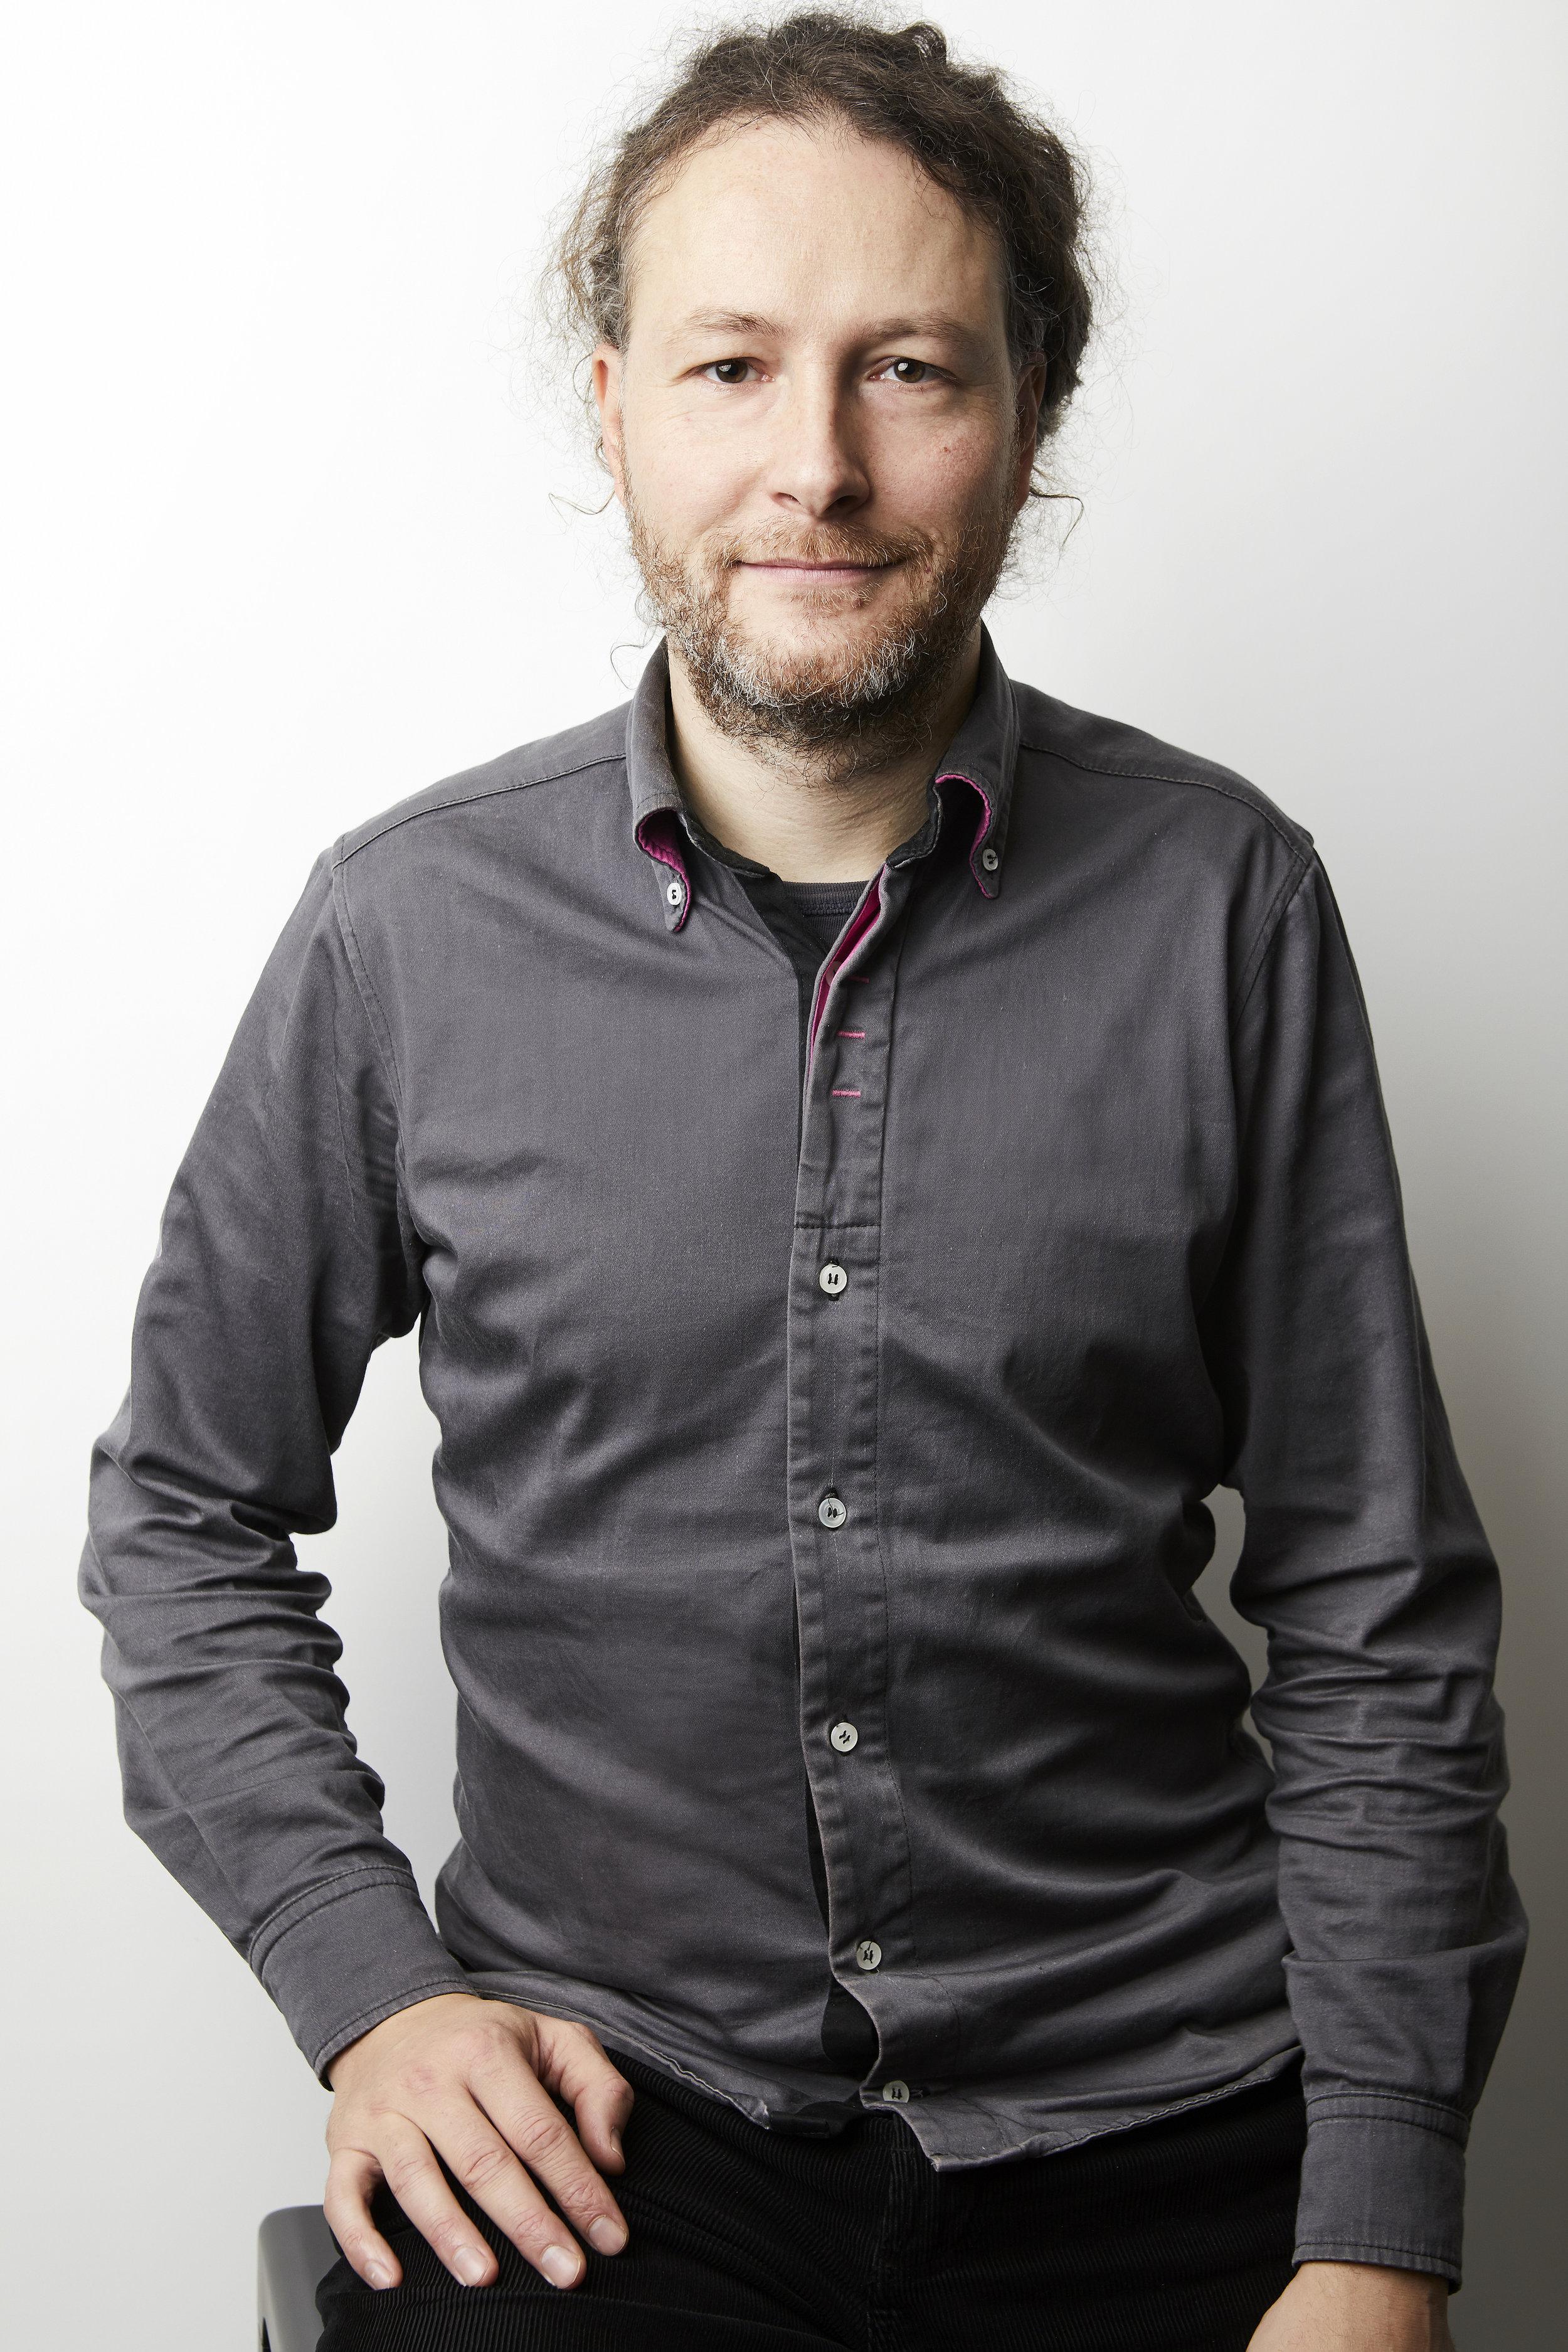 Adam Popel